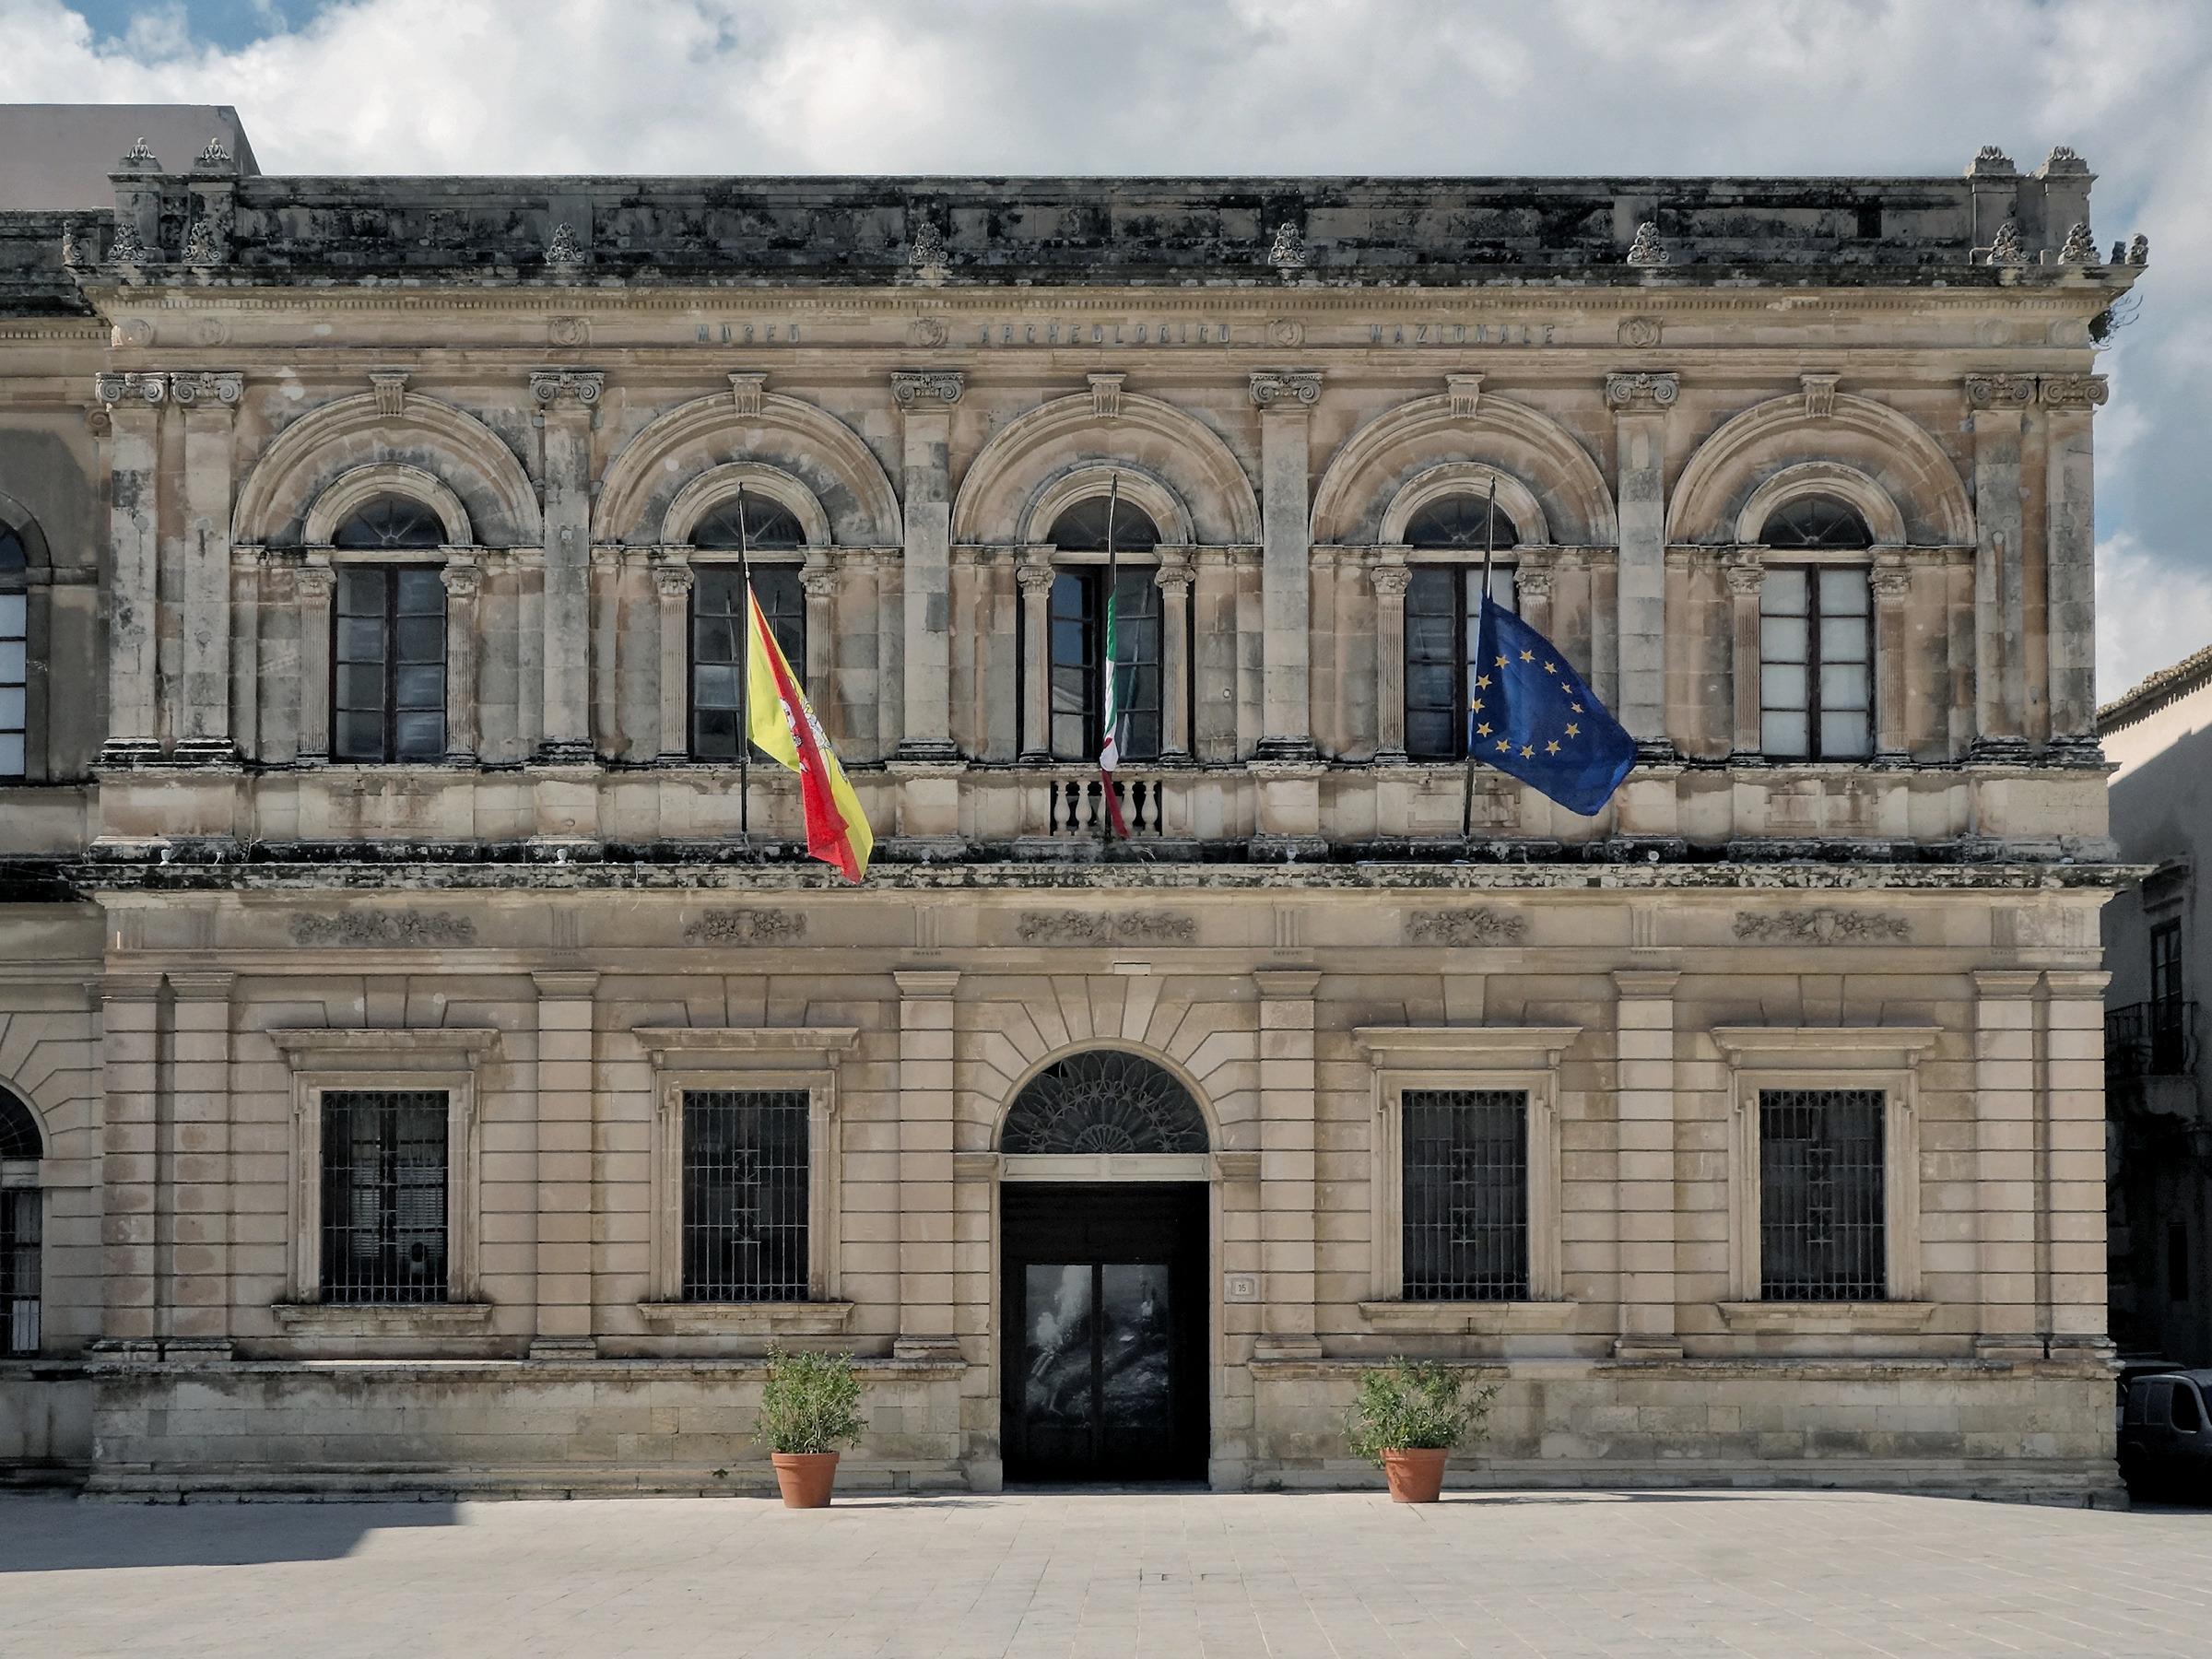 Museo Archeologico Nazionale.File Museo Archeologico Nazionale Siracusa Jpg Wikimedia Commons